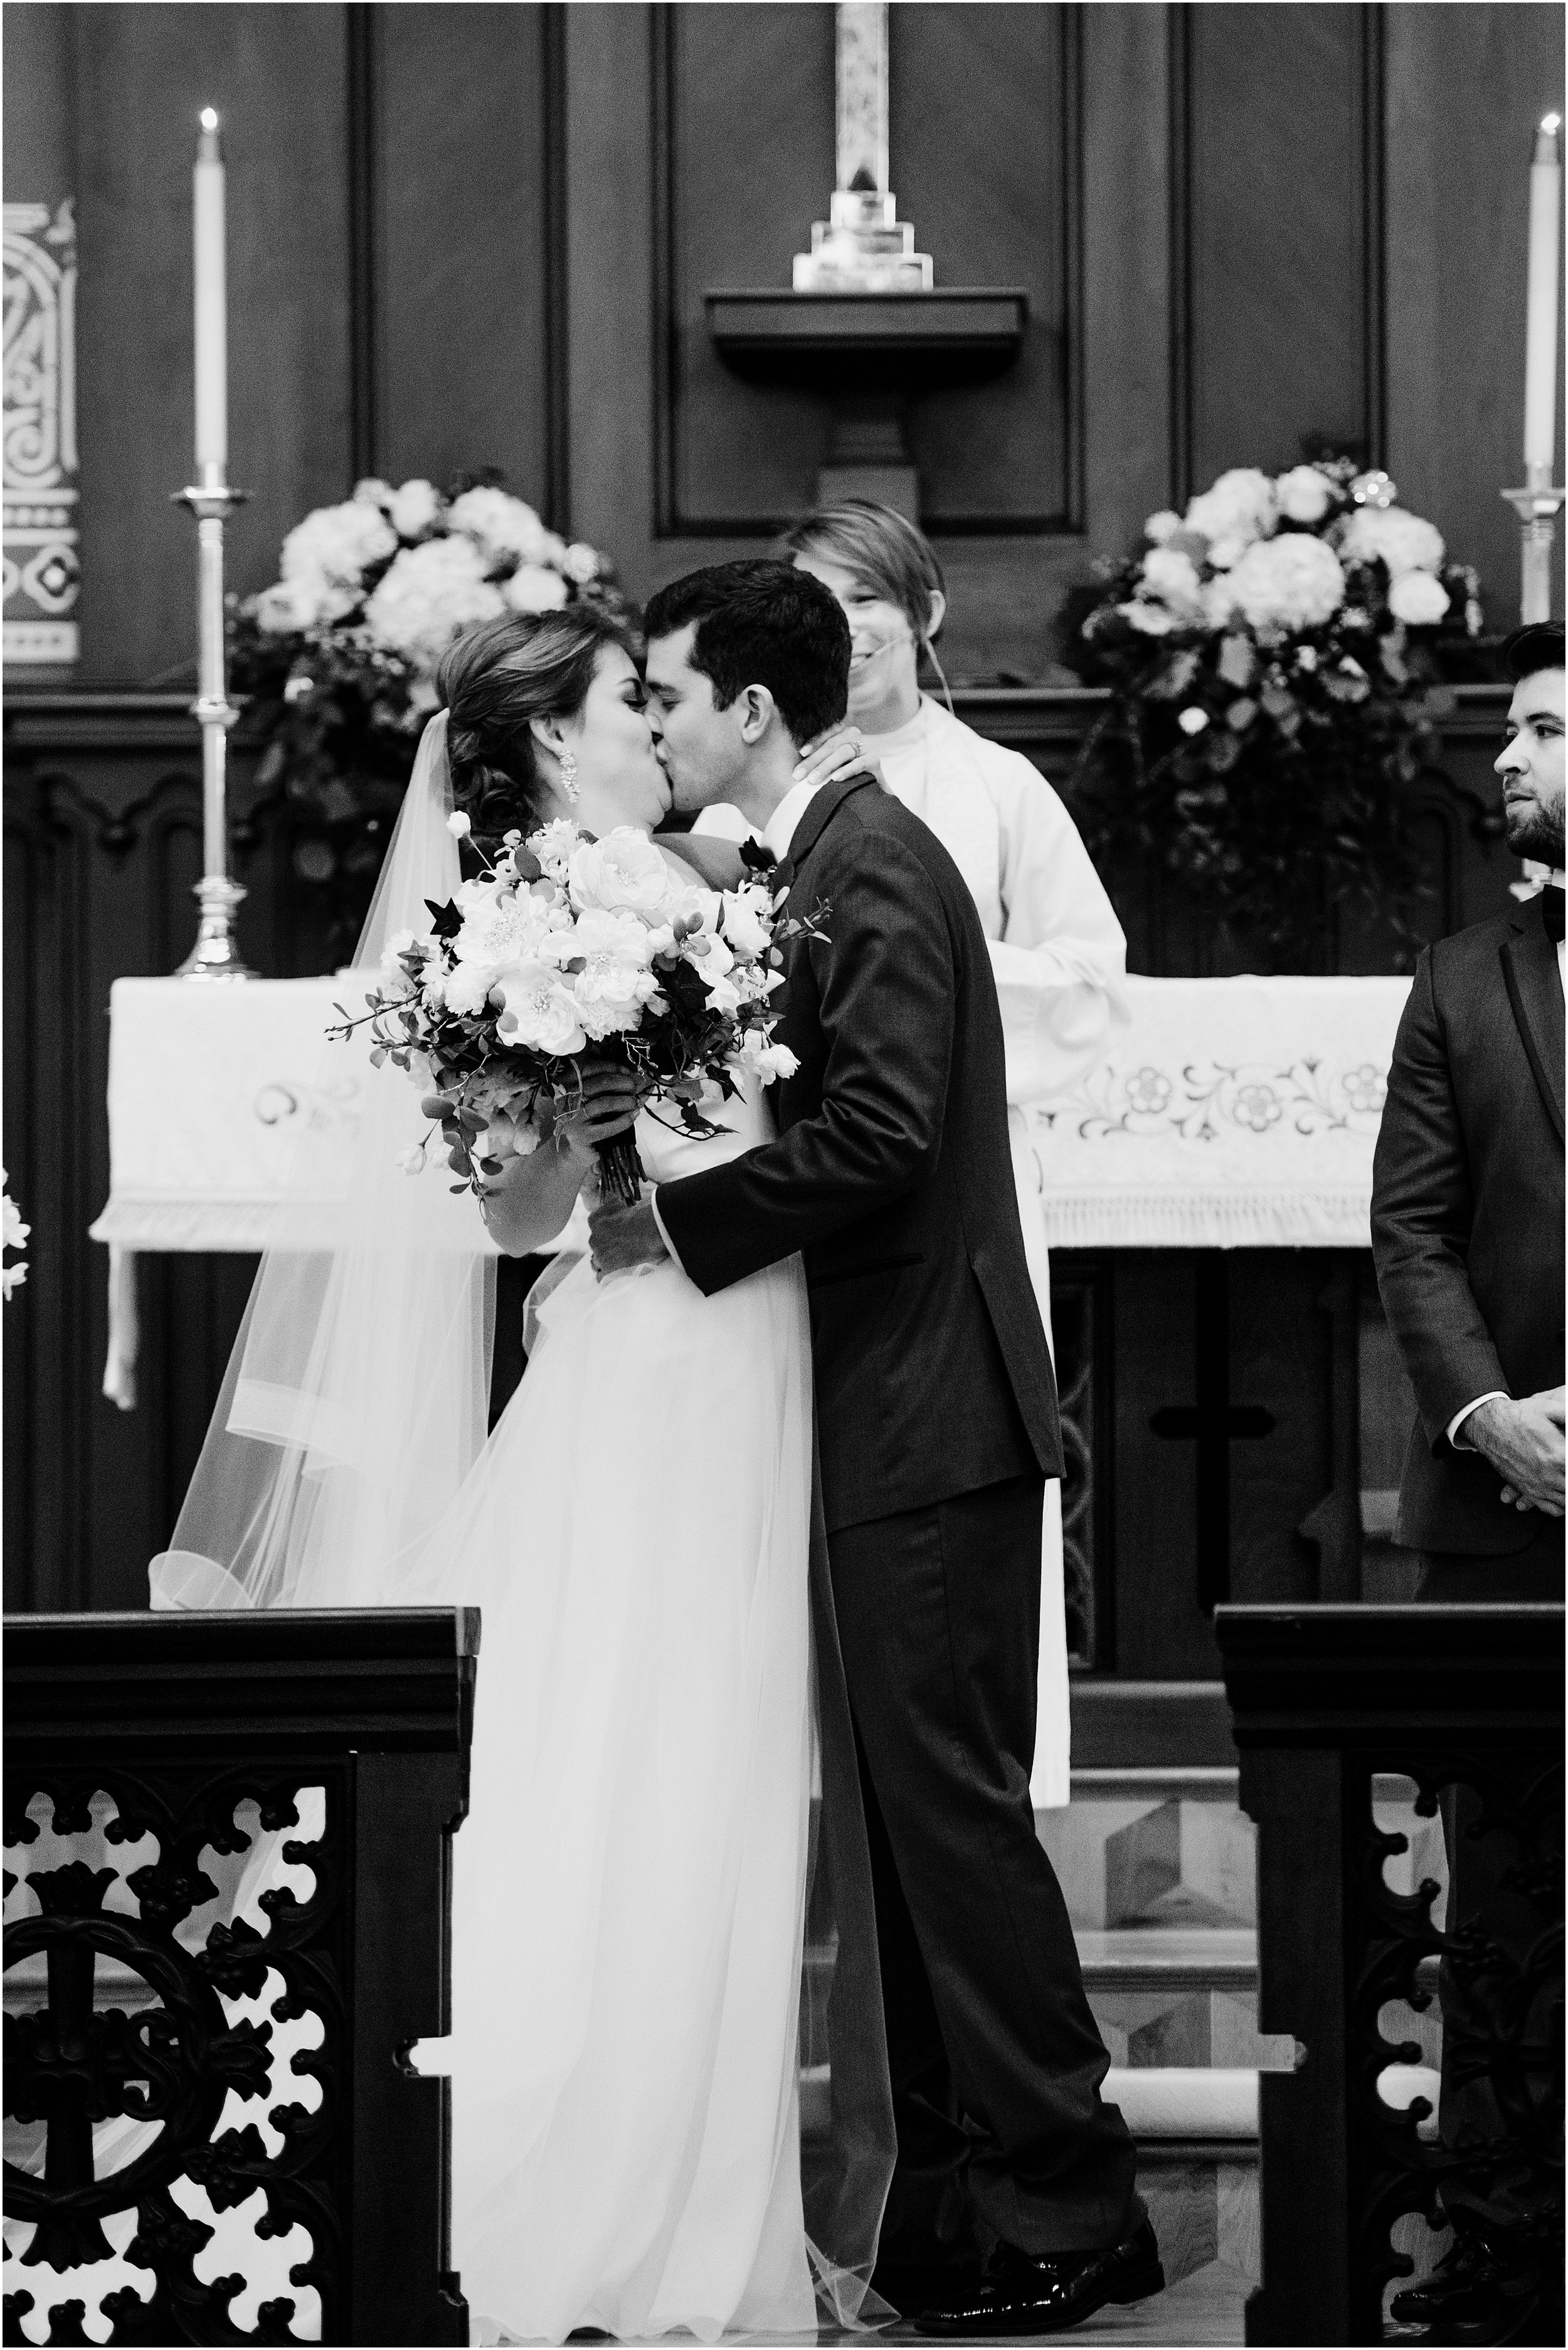 hannah leigh photography ellicott city church wedding baltimore md_2101.jpg